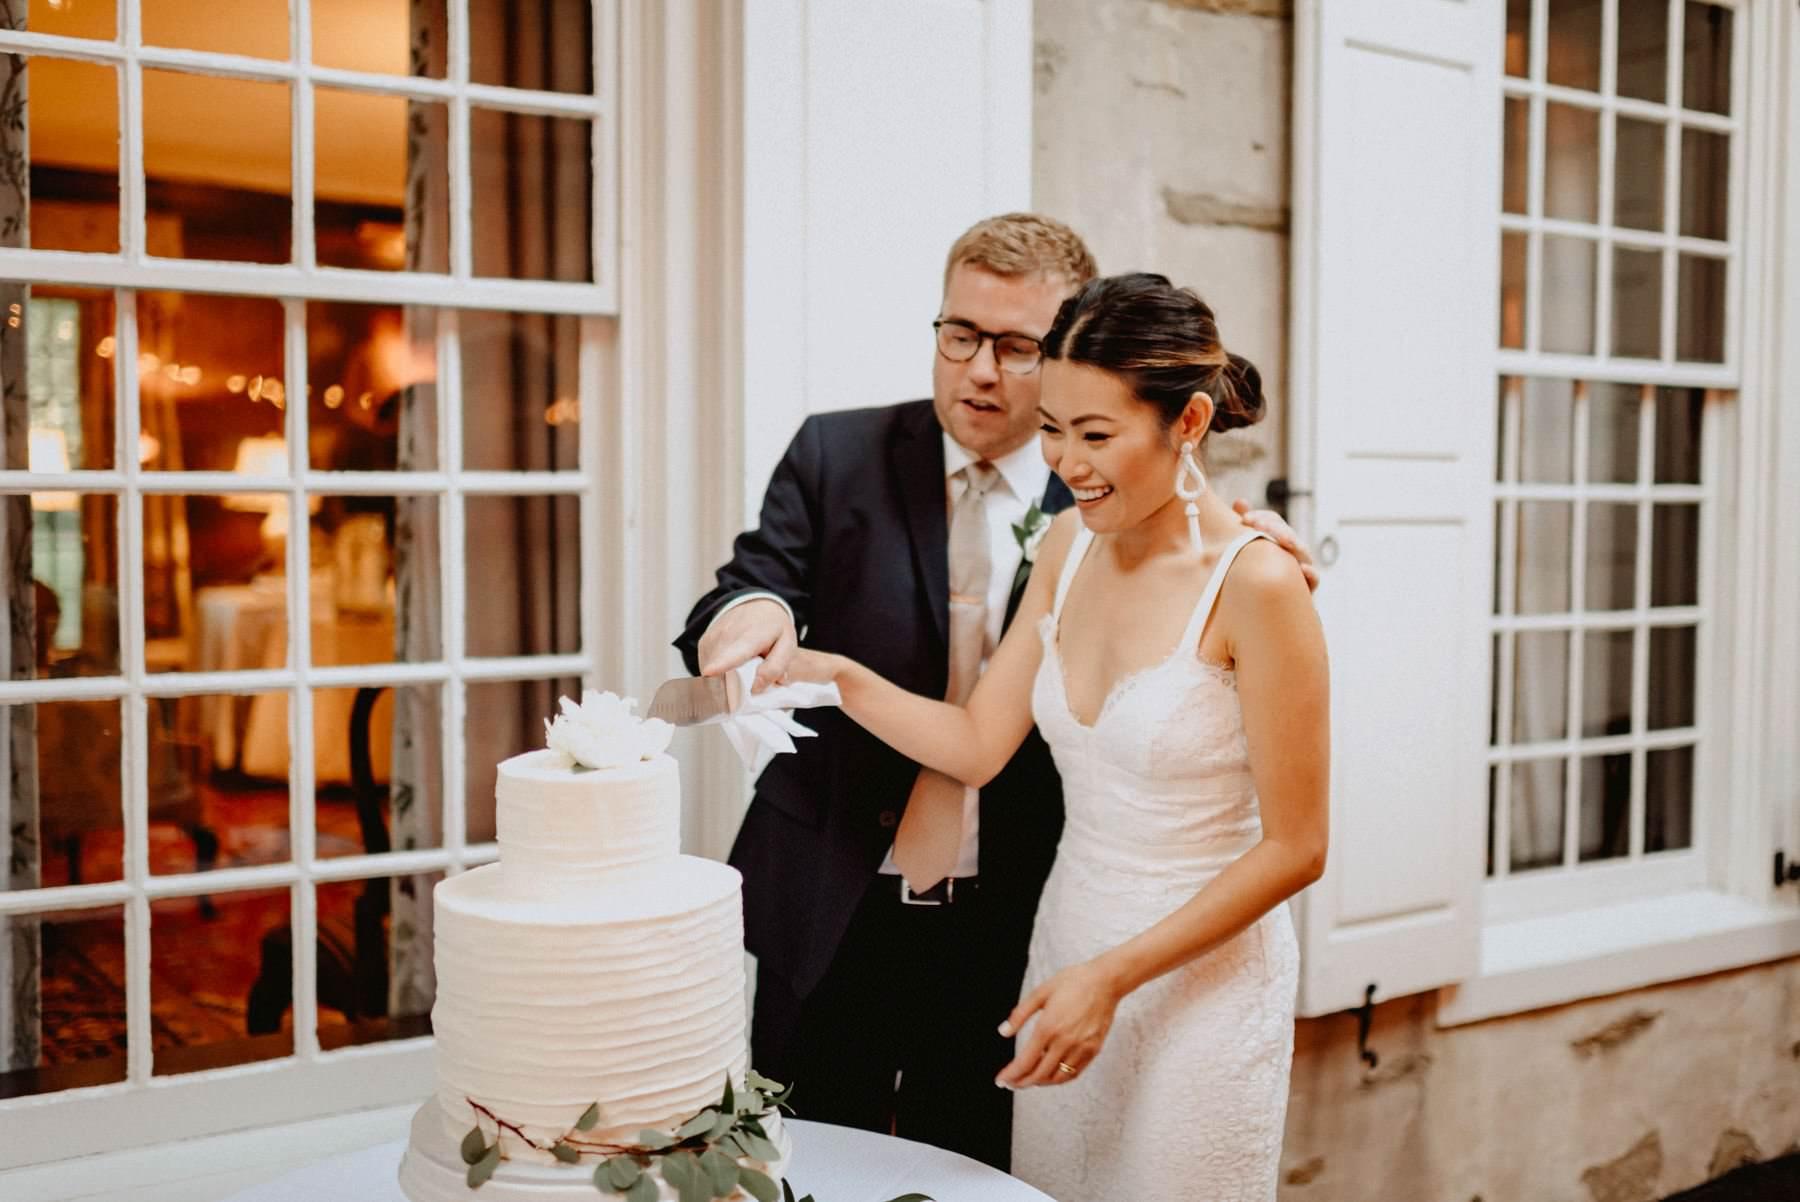 Appleford-estate-wedding-128.jpg